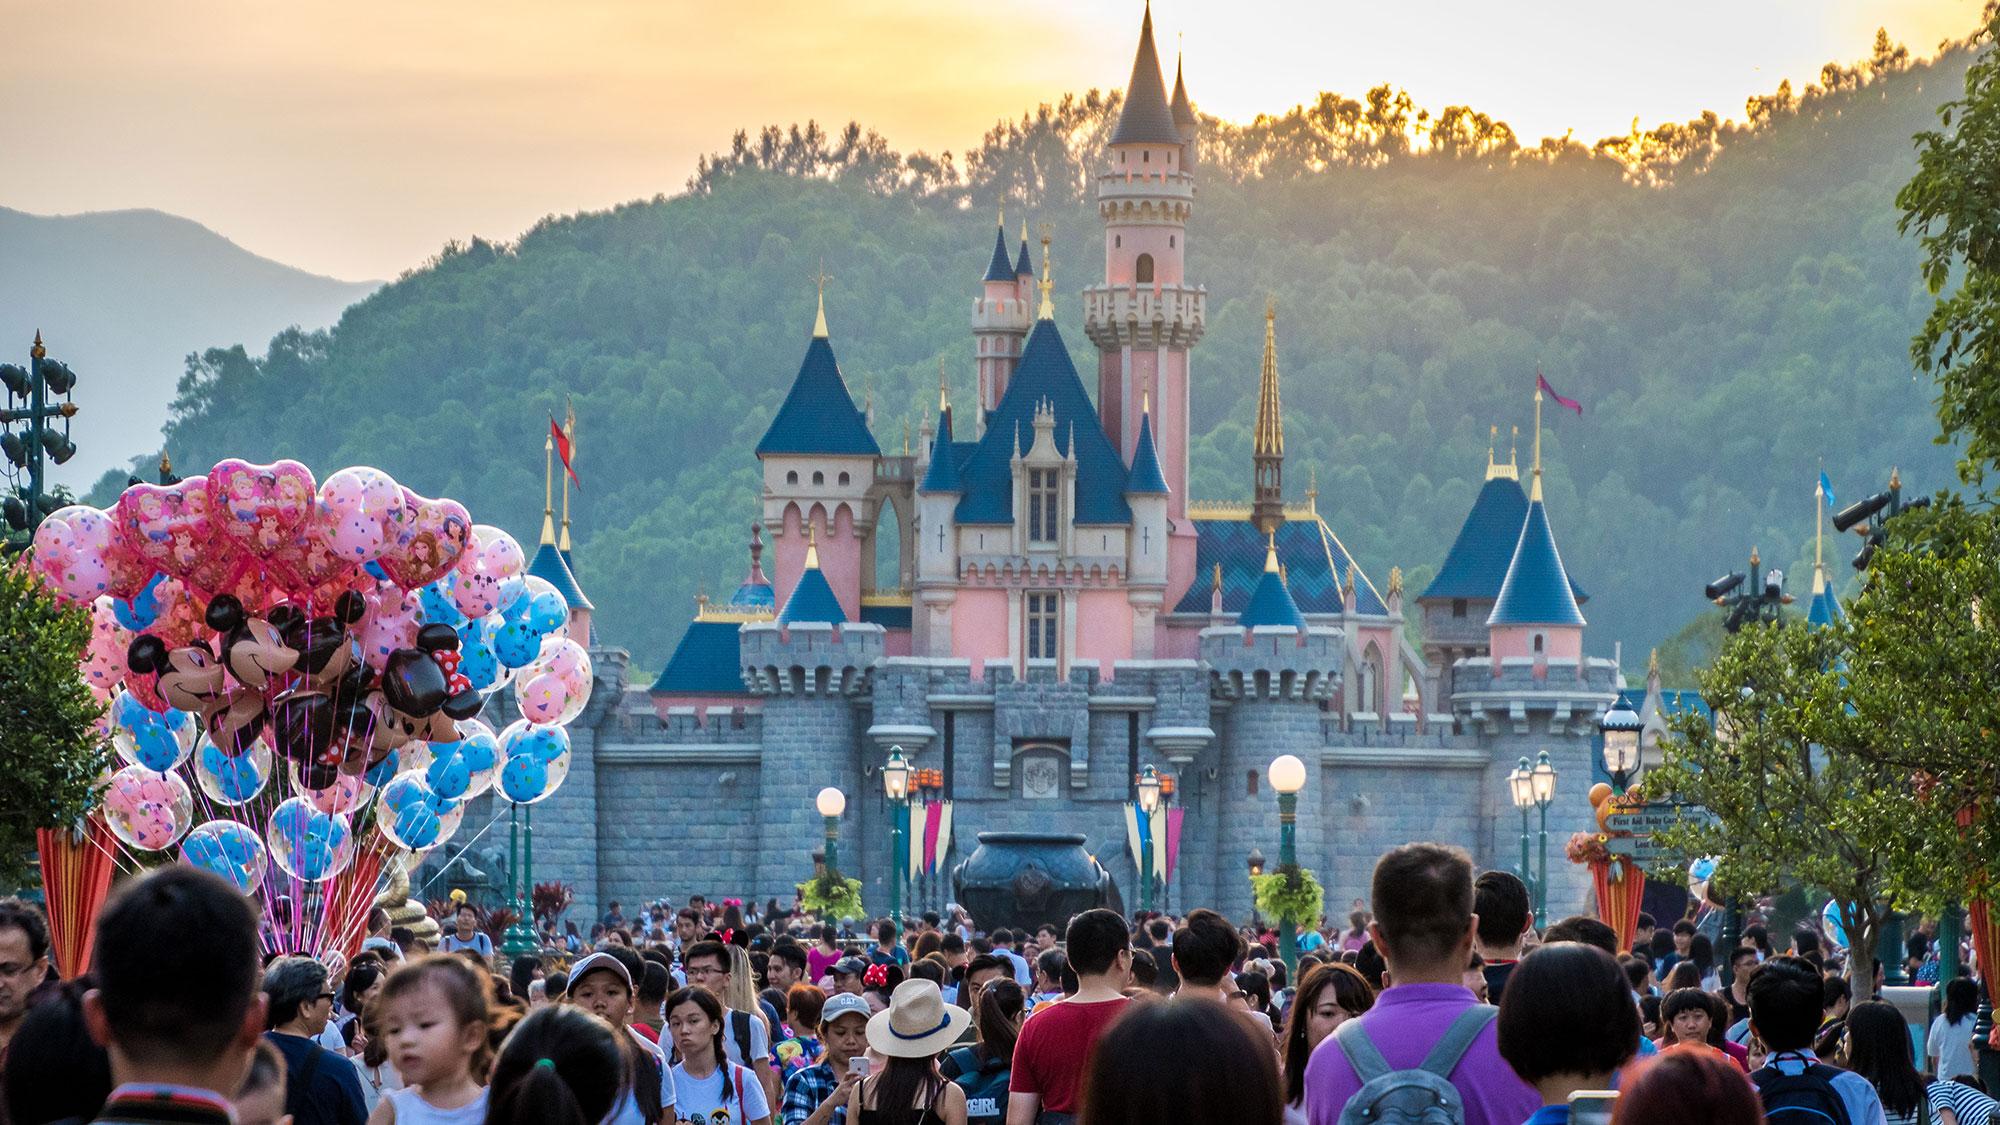 Losses At Hong Kong Disneyland Mar An Otherwise Strong Q4 For Disney Parks Travel Weekly